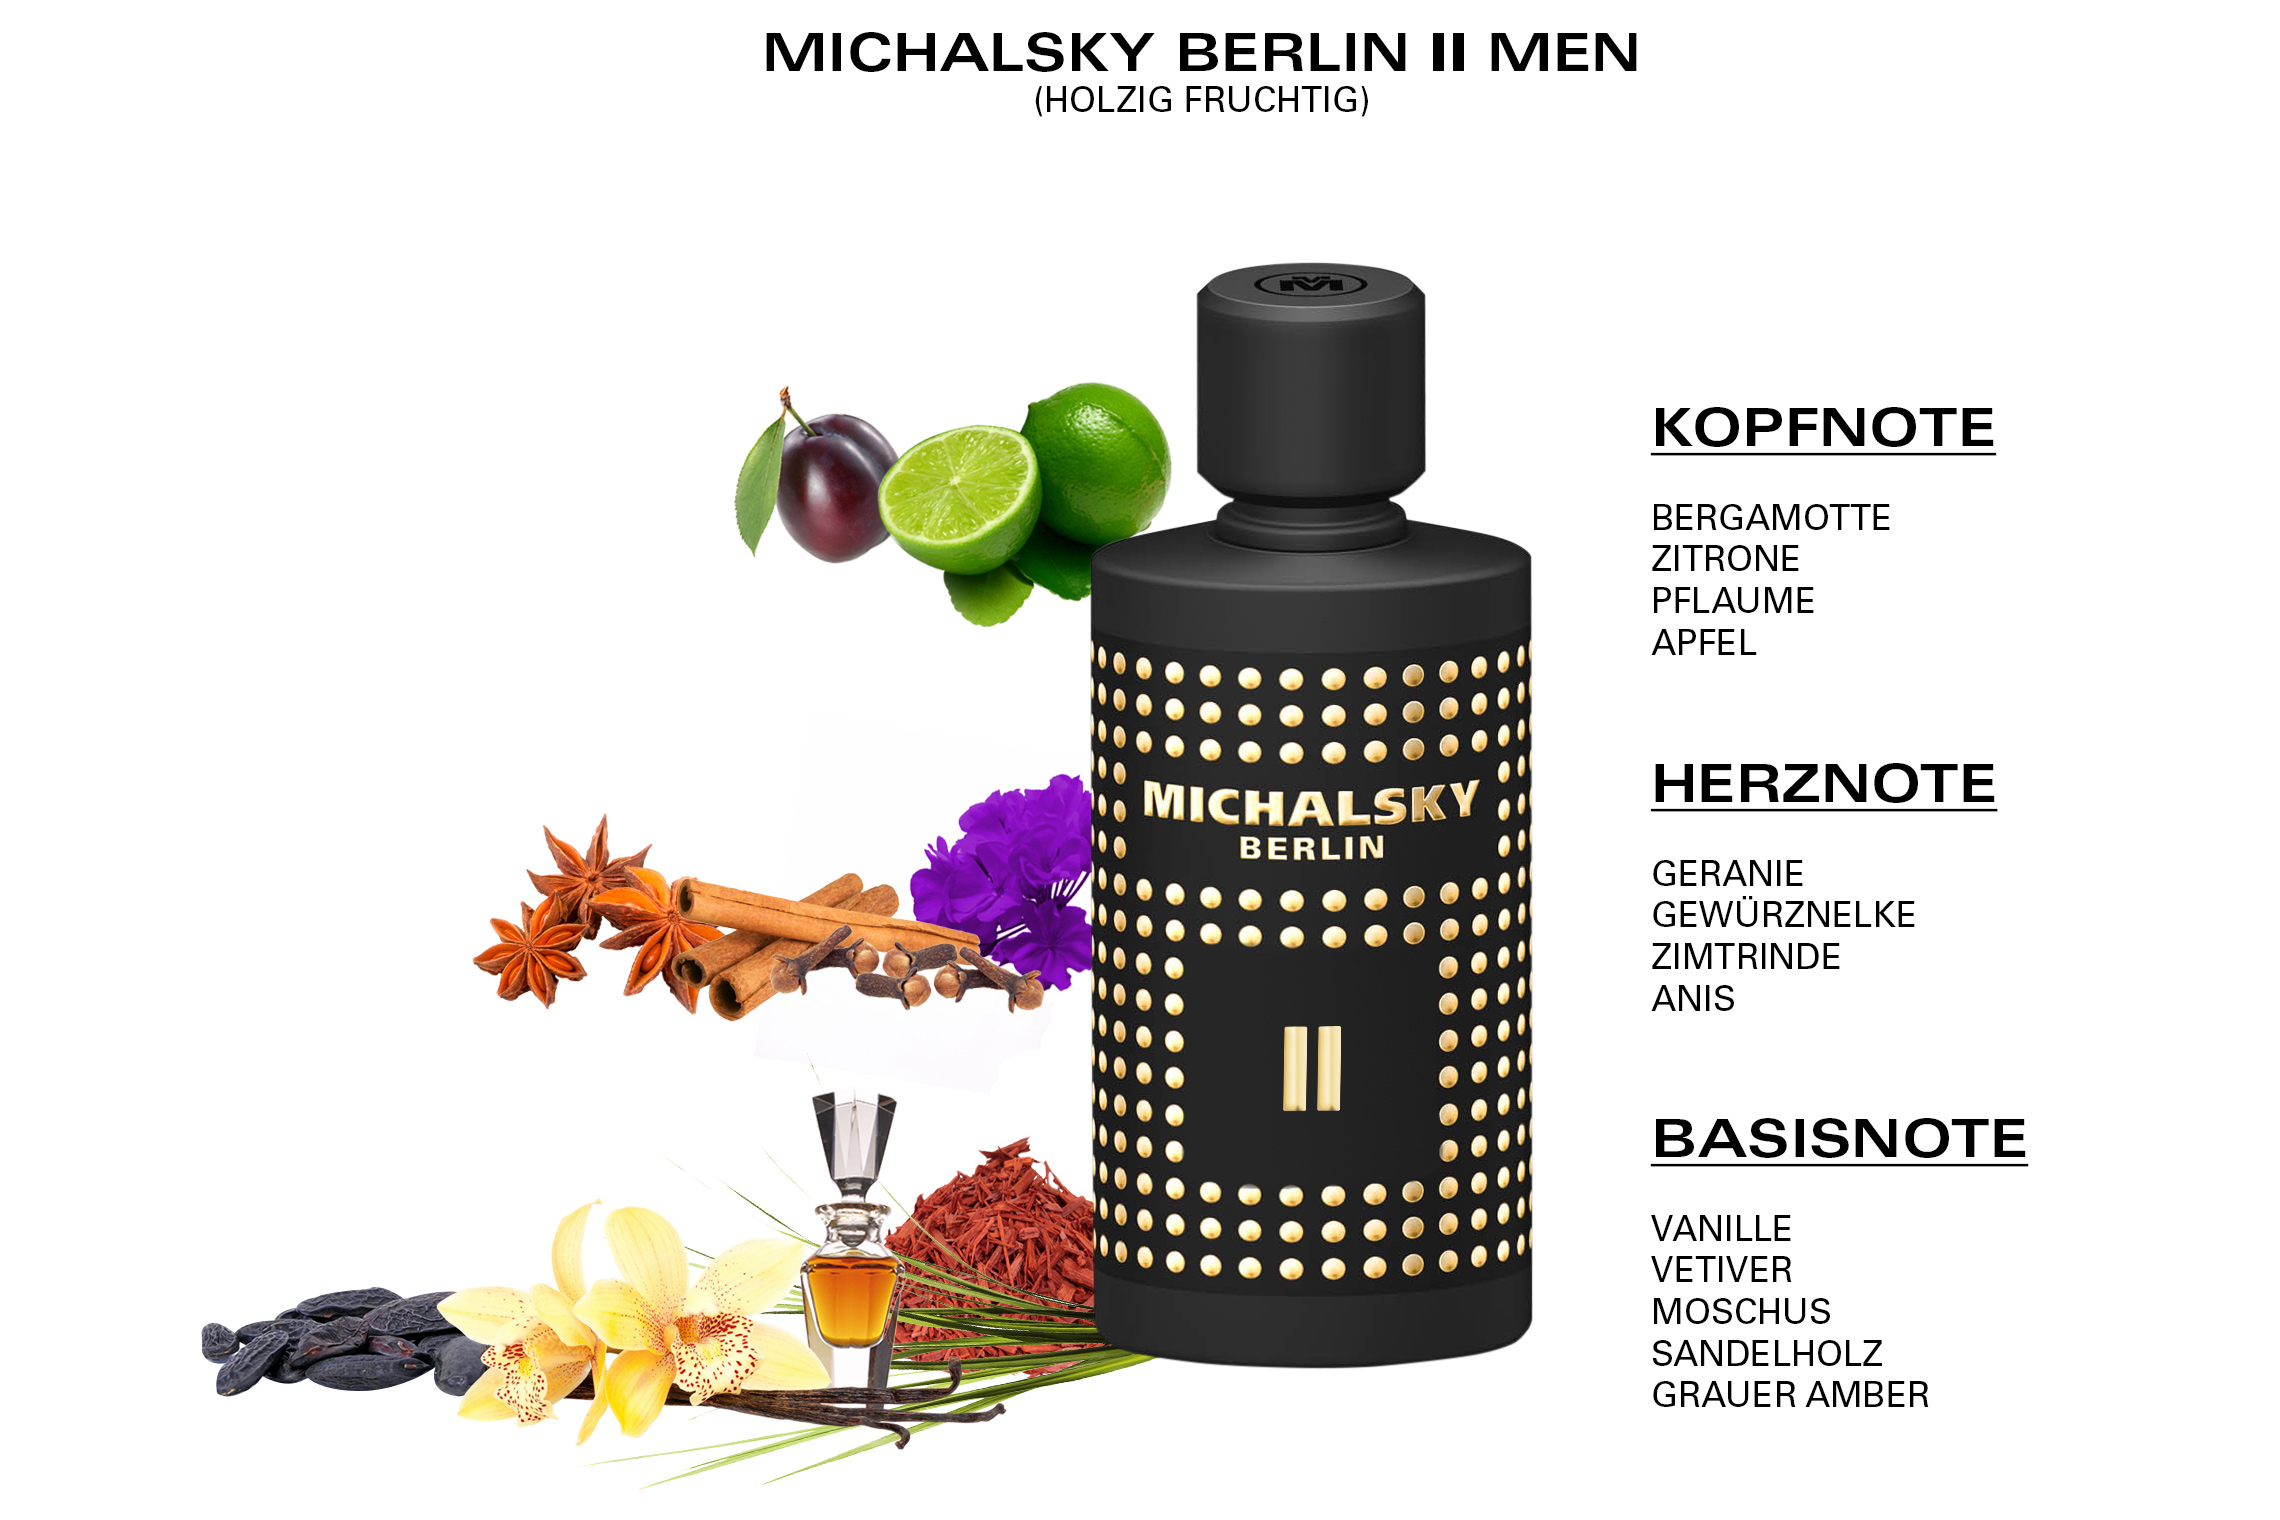 MICHALSKY_BERLIN_II_Duftpyramide_for_Men_3-2.jpg